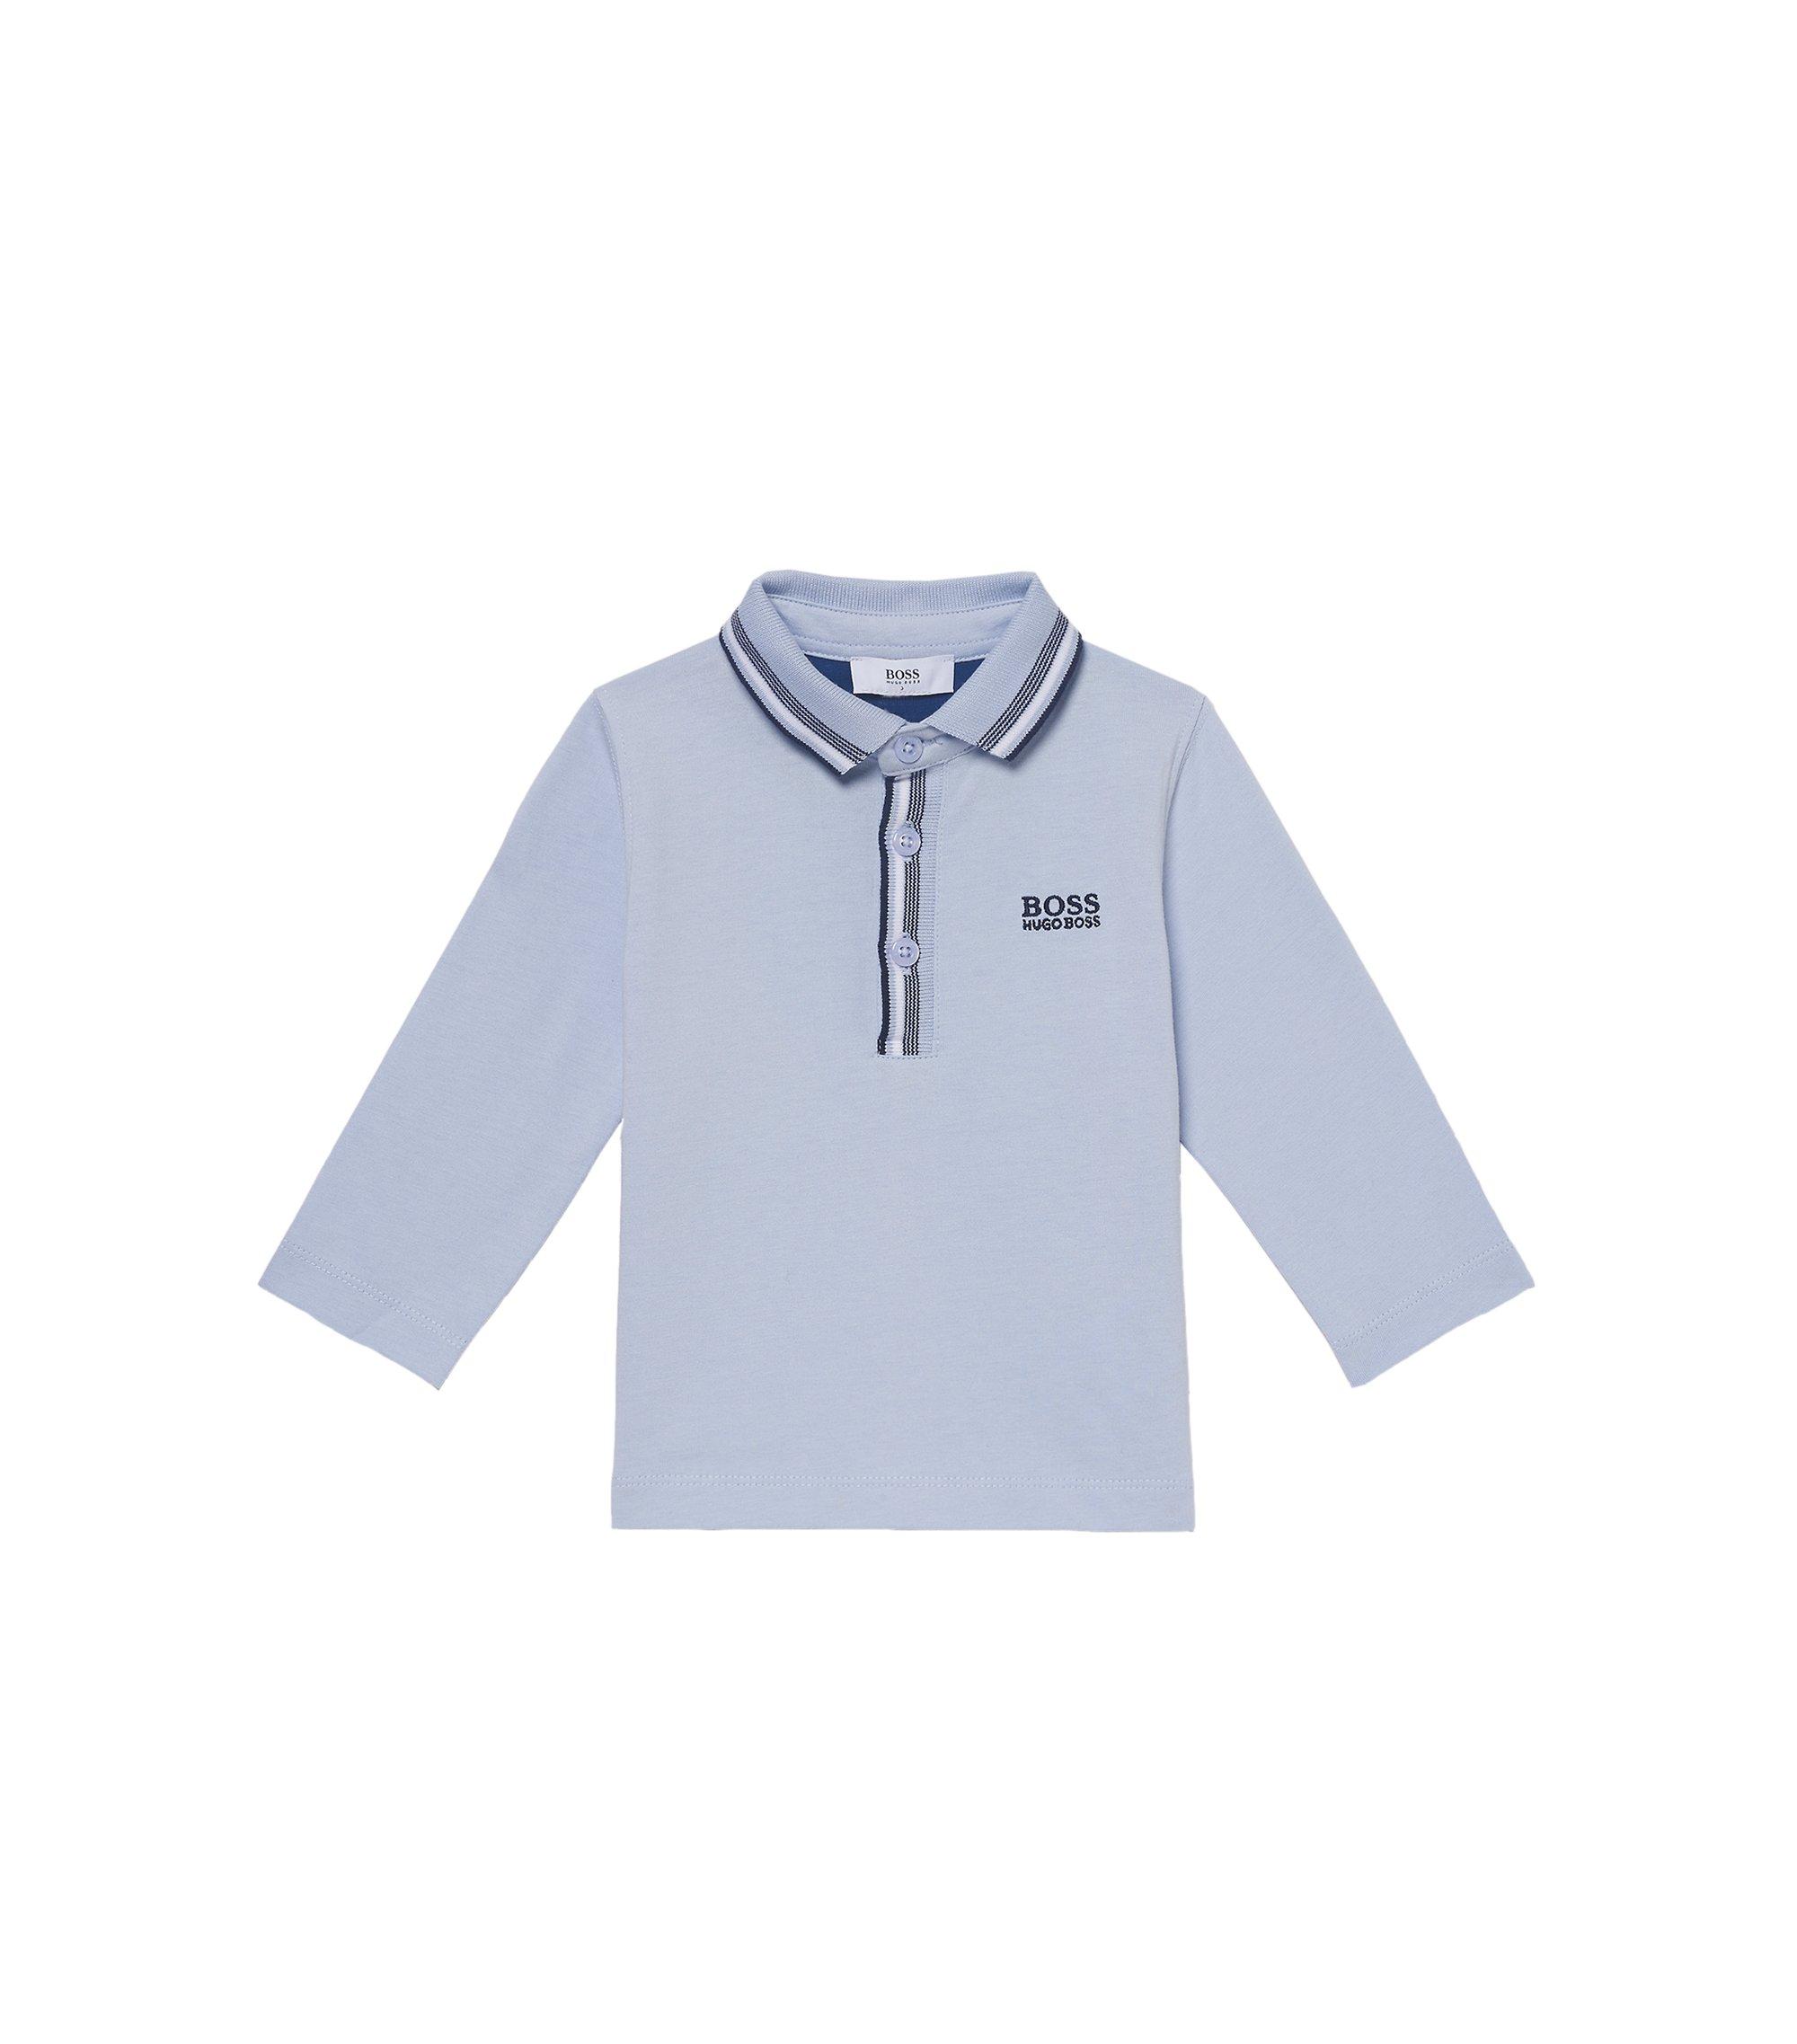 'J05500' | Toddler Stretch Cotton Blend Polo Shirt, Light Blue